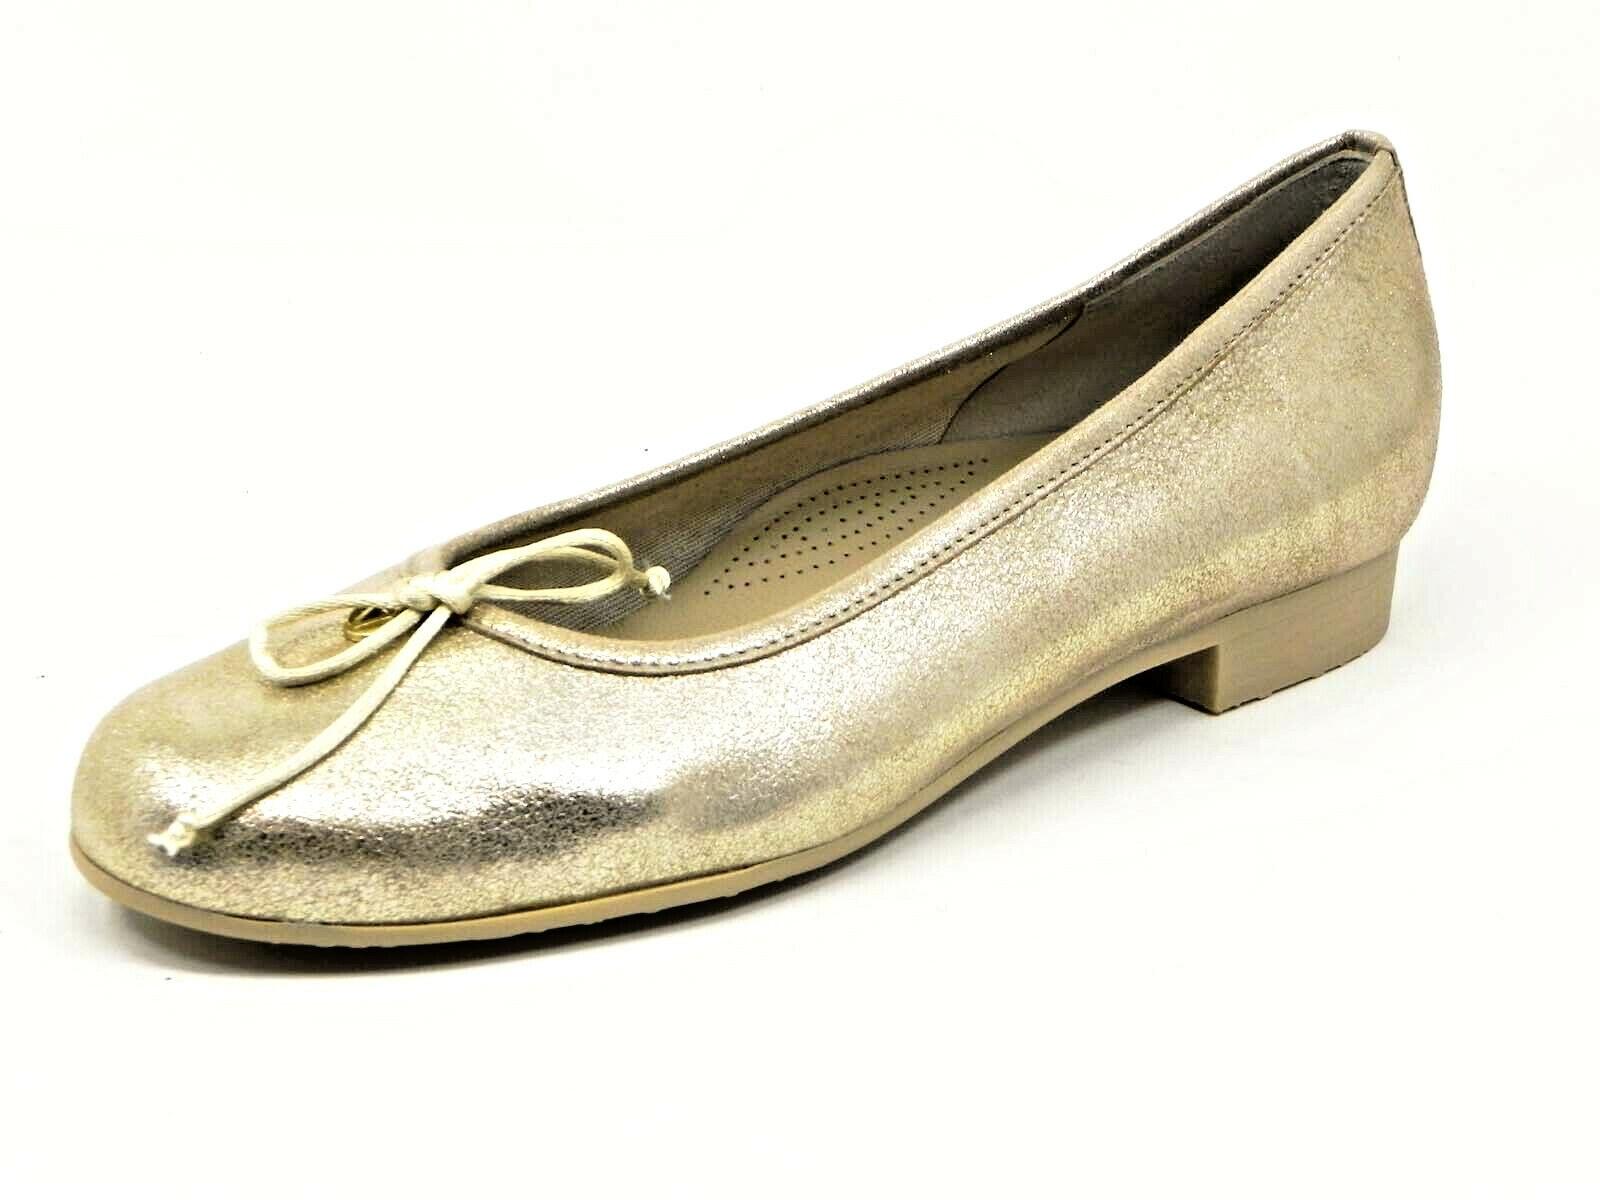 Vtuttieverde V11007 sautope donna btuttierina pelle laminata oro (85,00 -30%)  saldi